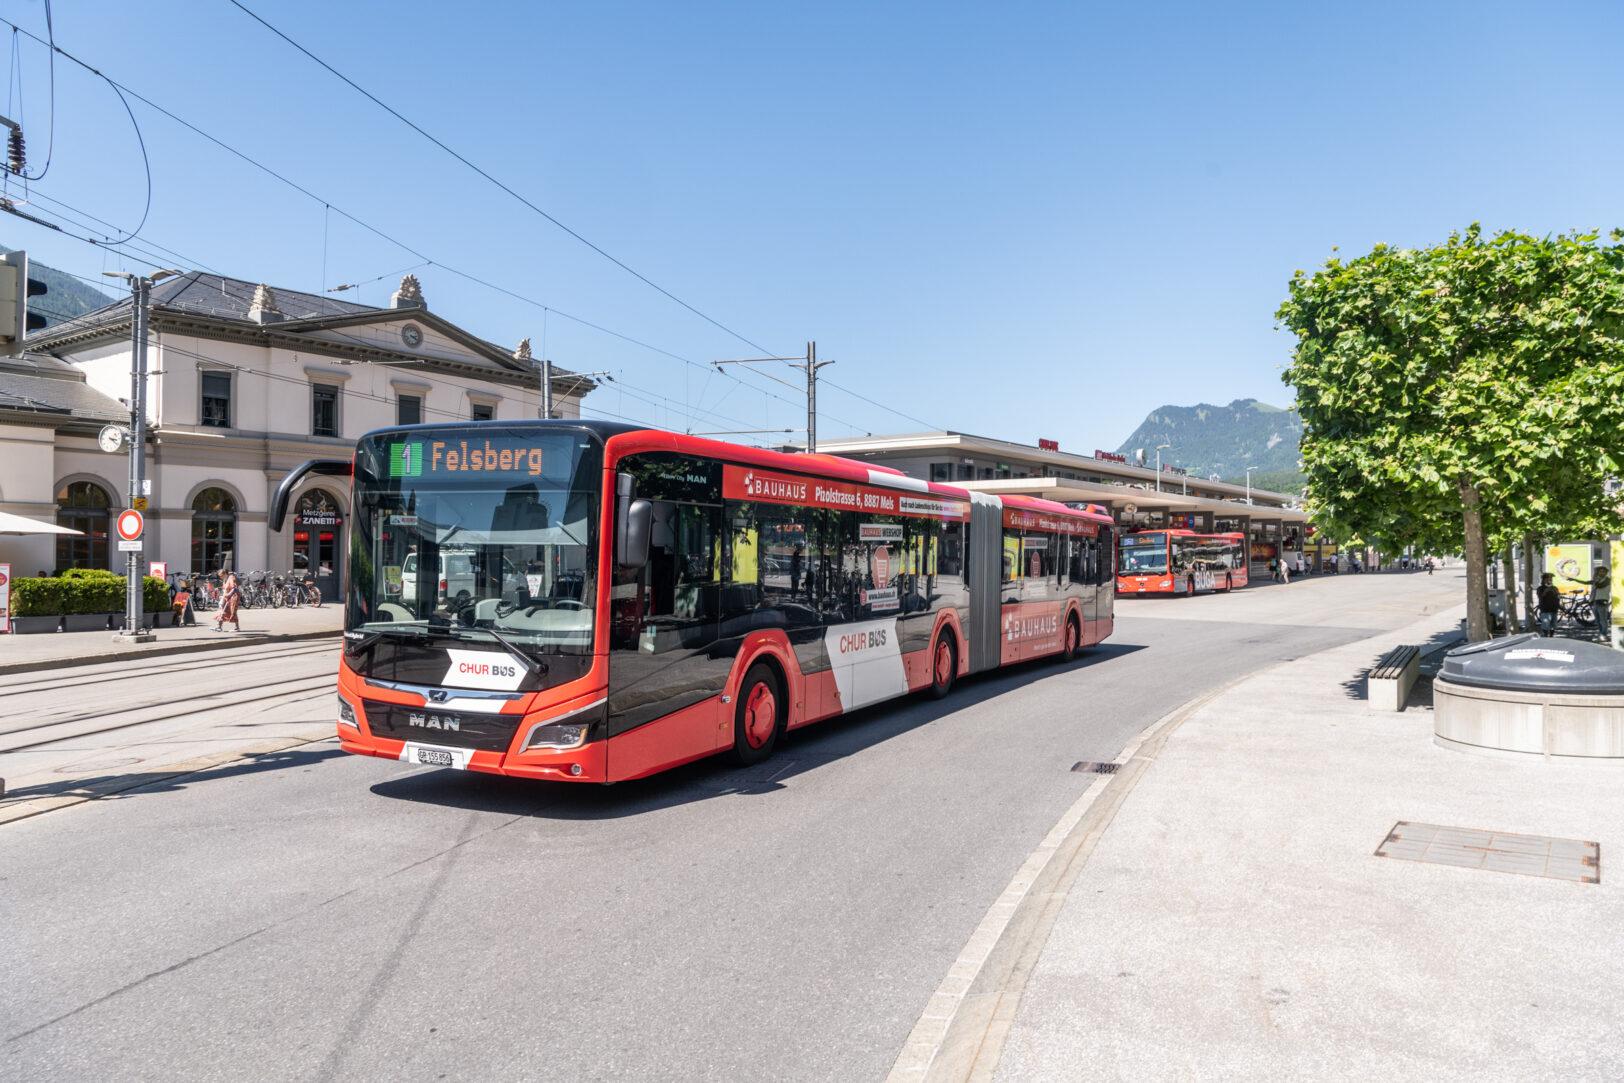 Chur Bus am Bahnhof Chur